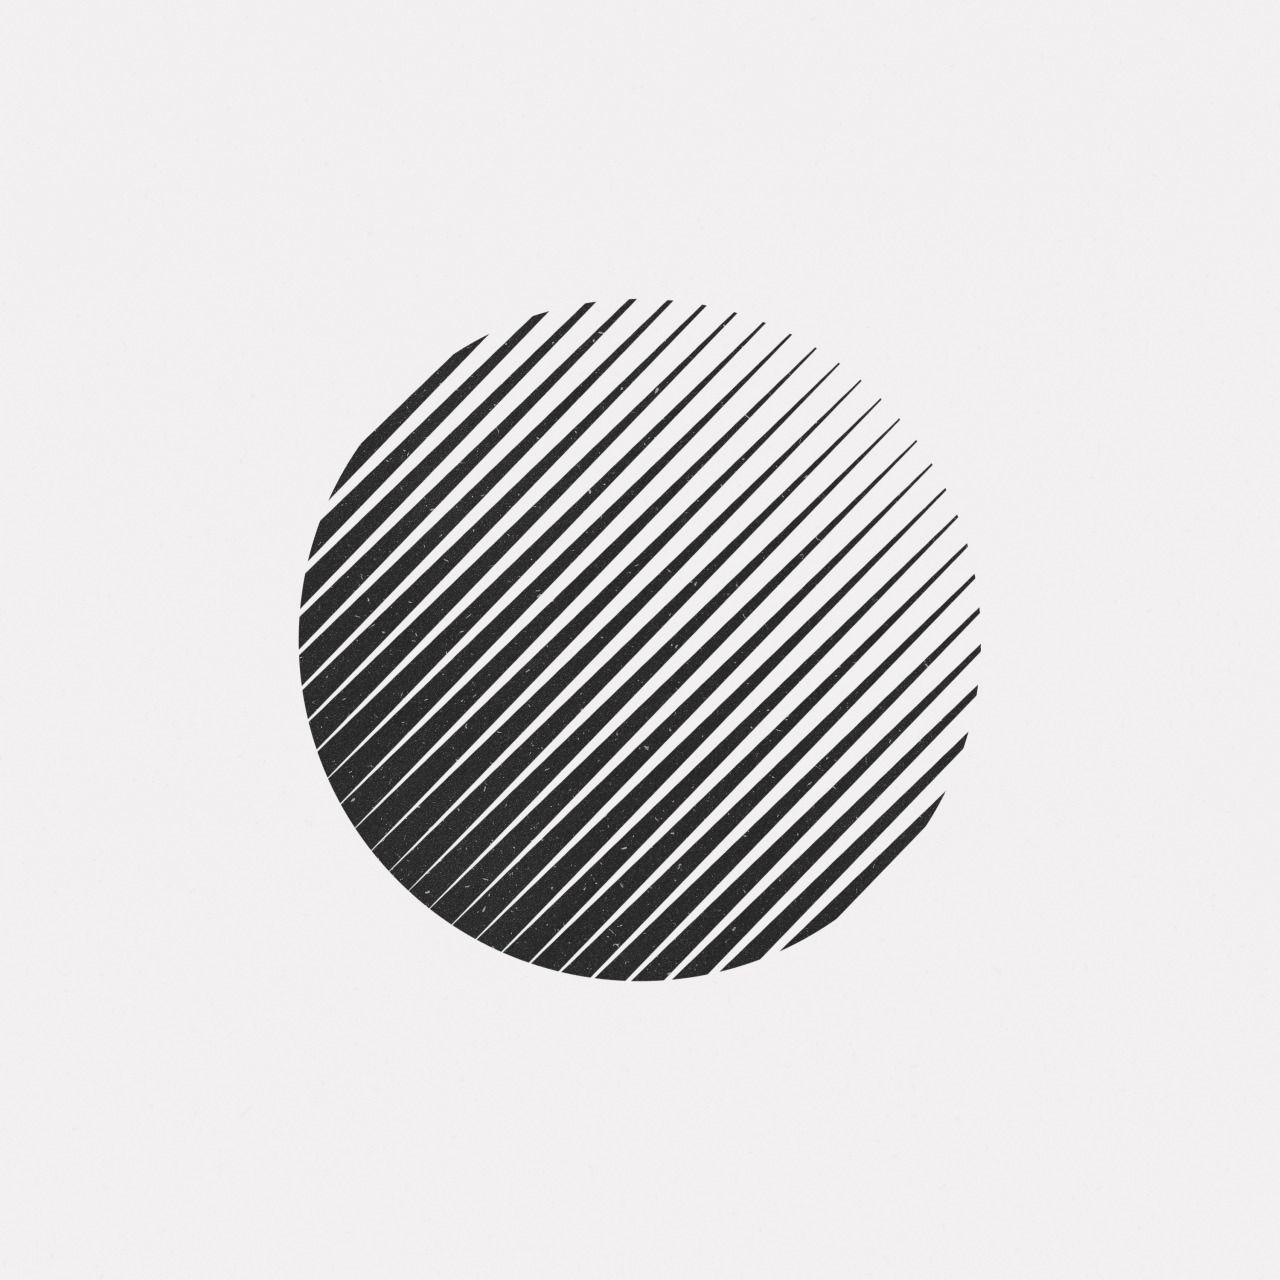 Ma16 505a New Geometric Design Every Day